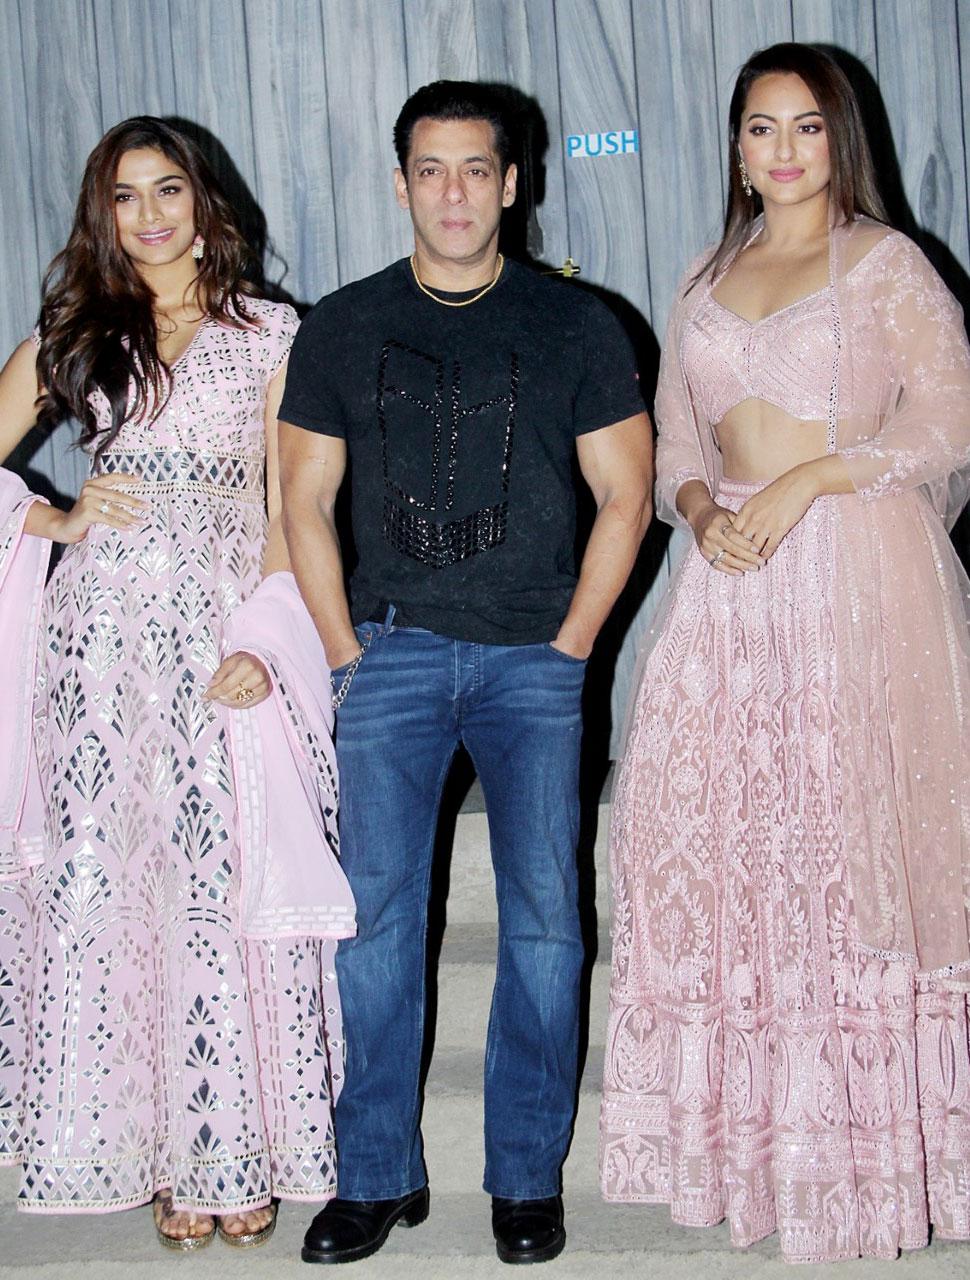 Salman Khan Pravudeva Sonakshi Sinha Saaiee Manjrekar clicked promotions of Dabangg at bigboss set